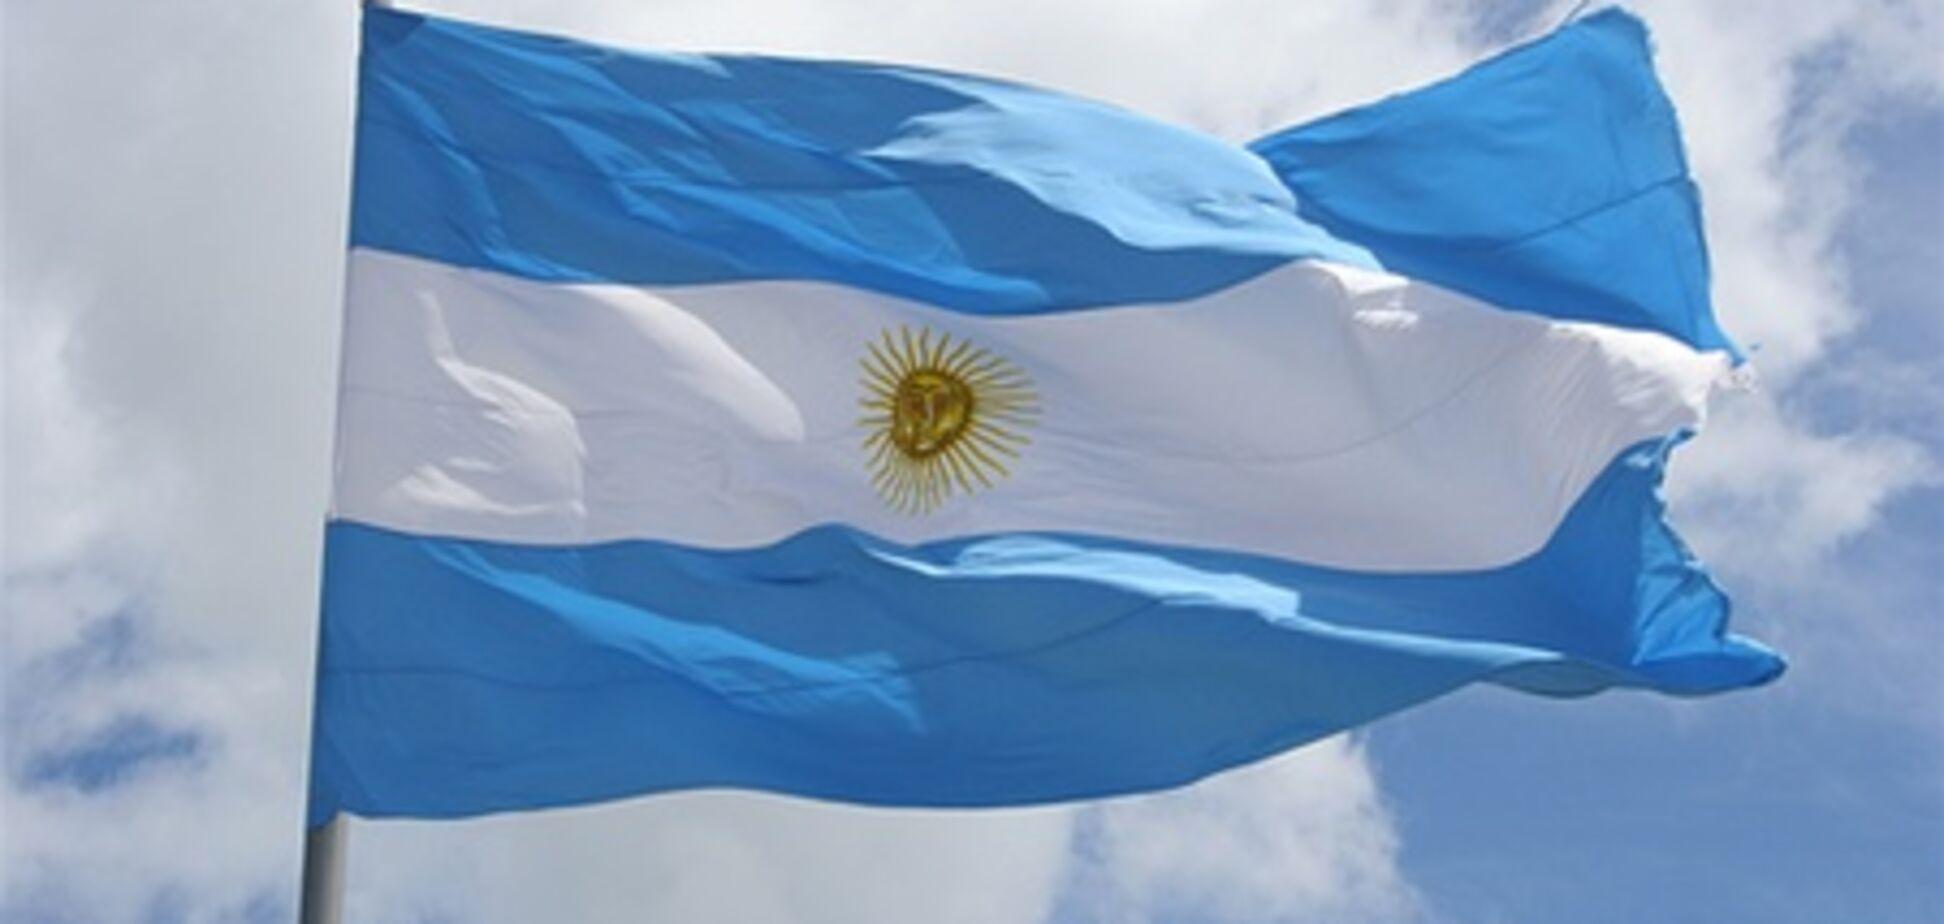 Украина и Аргентина установили безвизовый режим